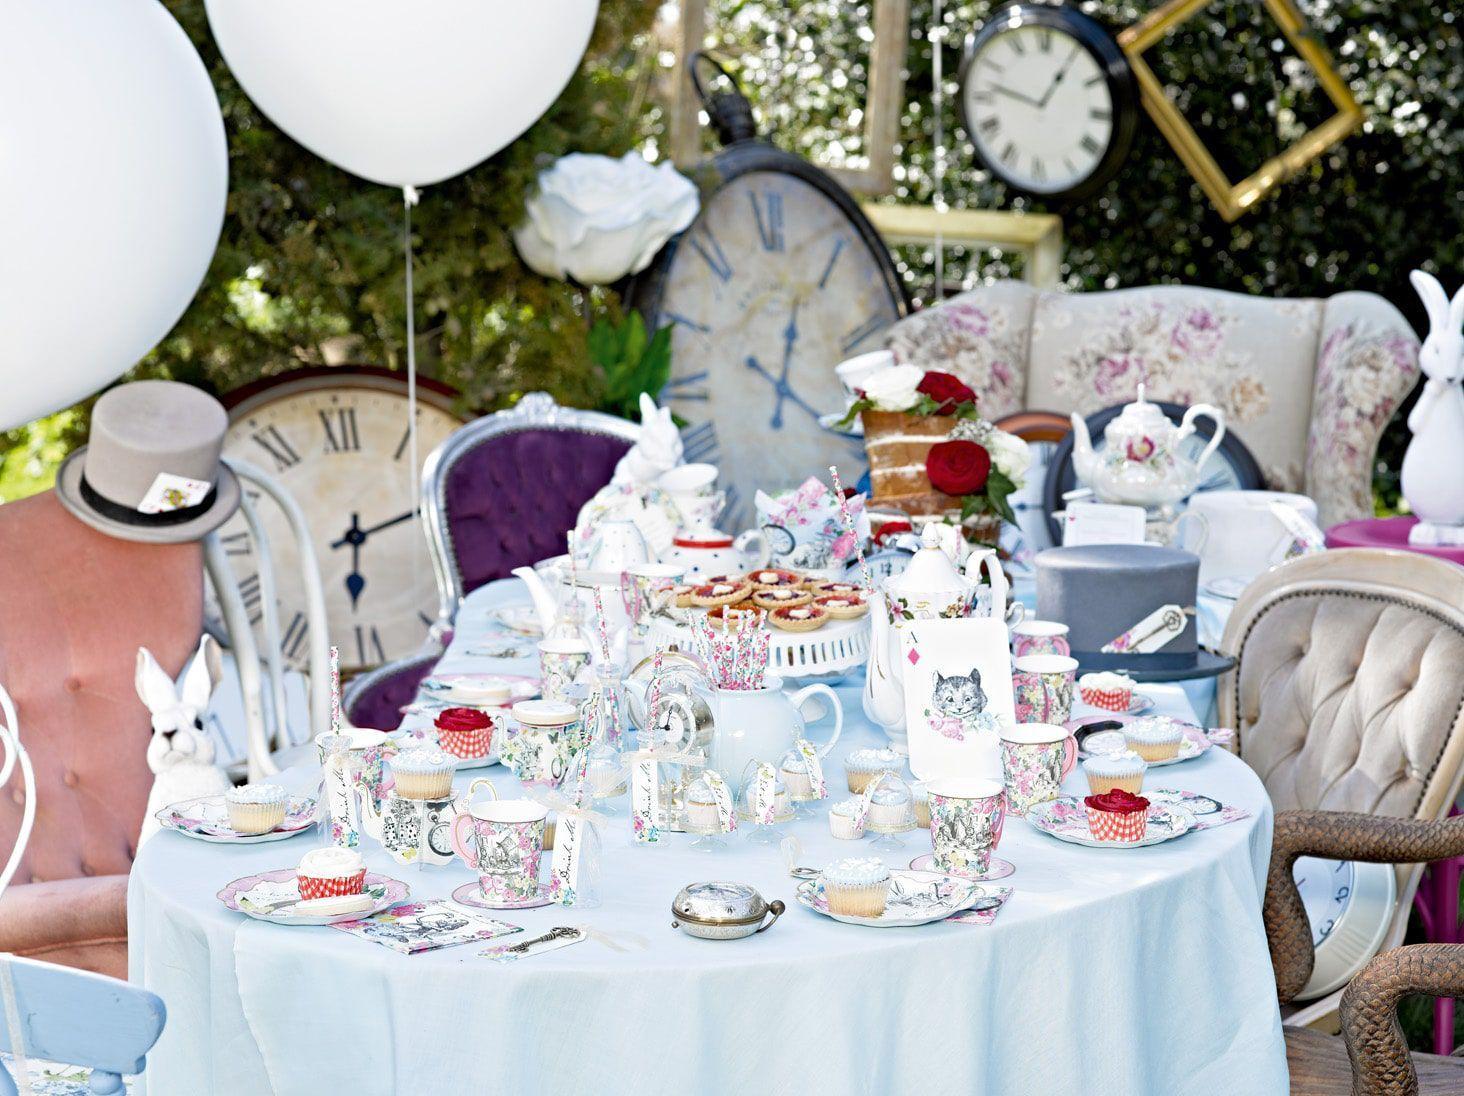 009 Stunning Alice In Wonderland Tea Party Template Highest Clarity  Templates Invitation FreeFull